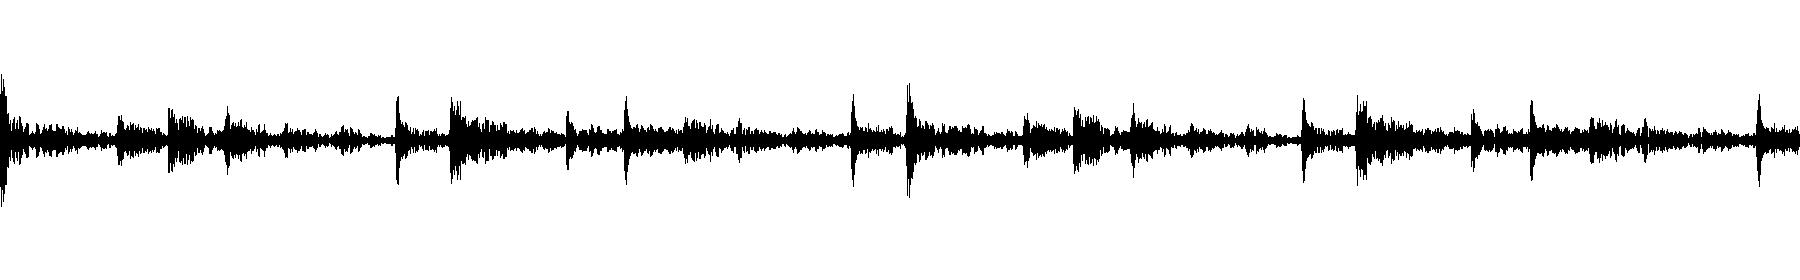 blbc cinedrumsb 95 04